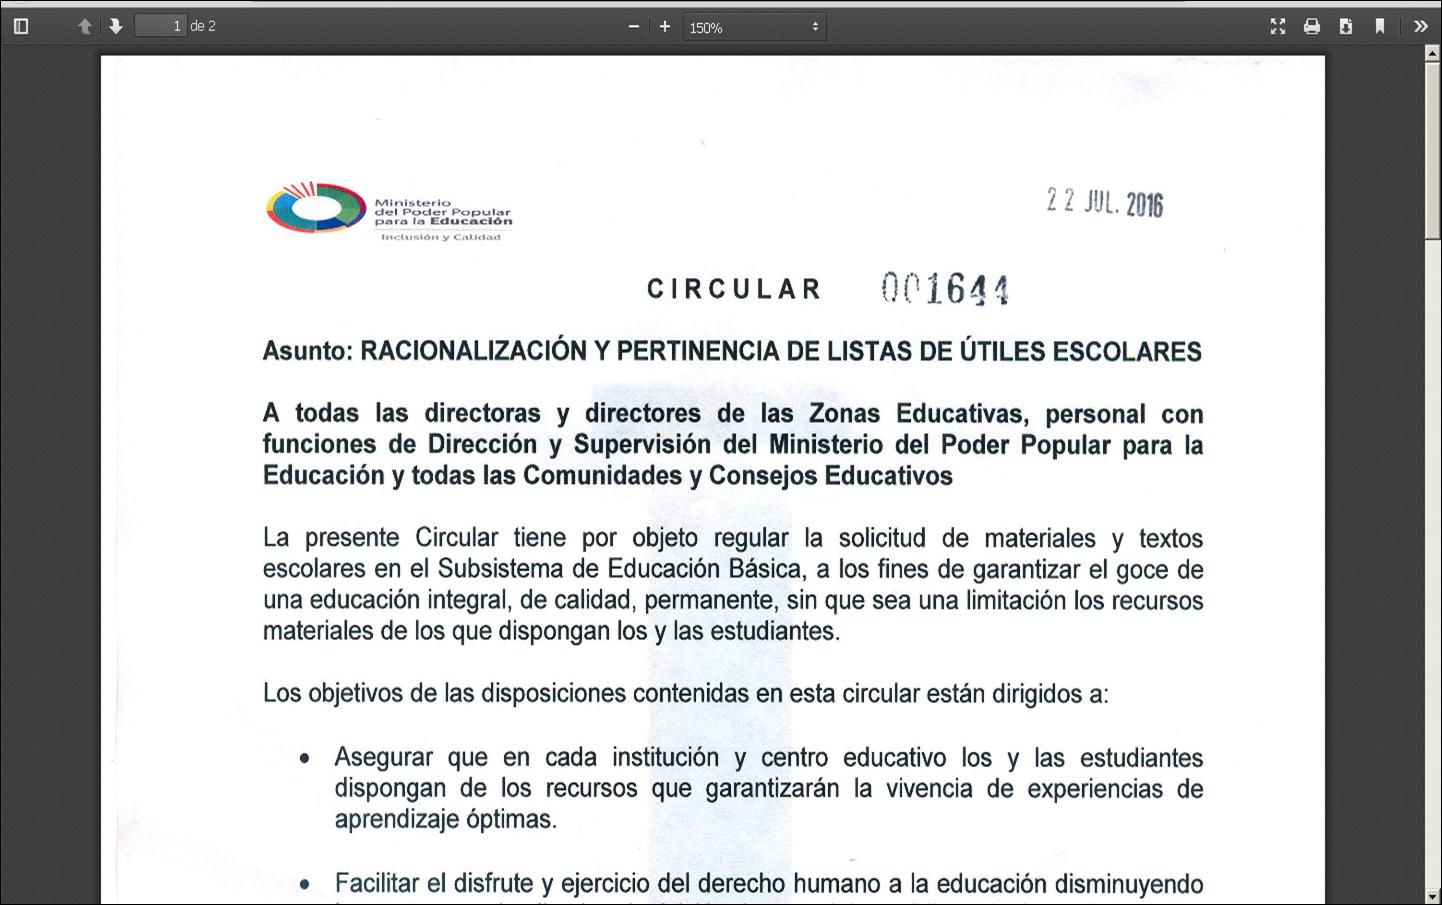 CIRCULAR 001644 RACIONALIZACIÓN Y PERTINENCIA DE LISTAS DE ÚTILES ESCOLARES